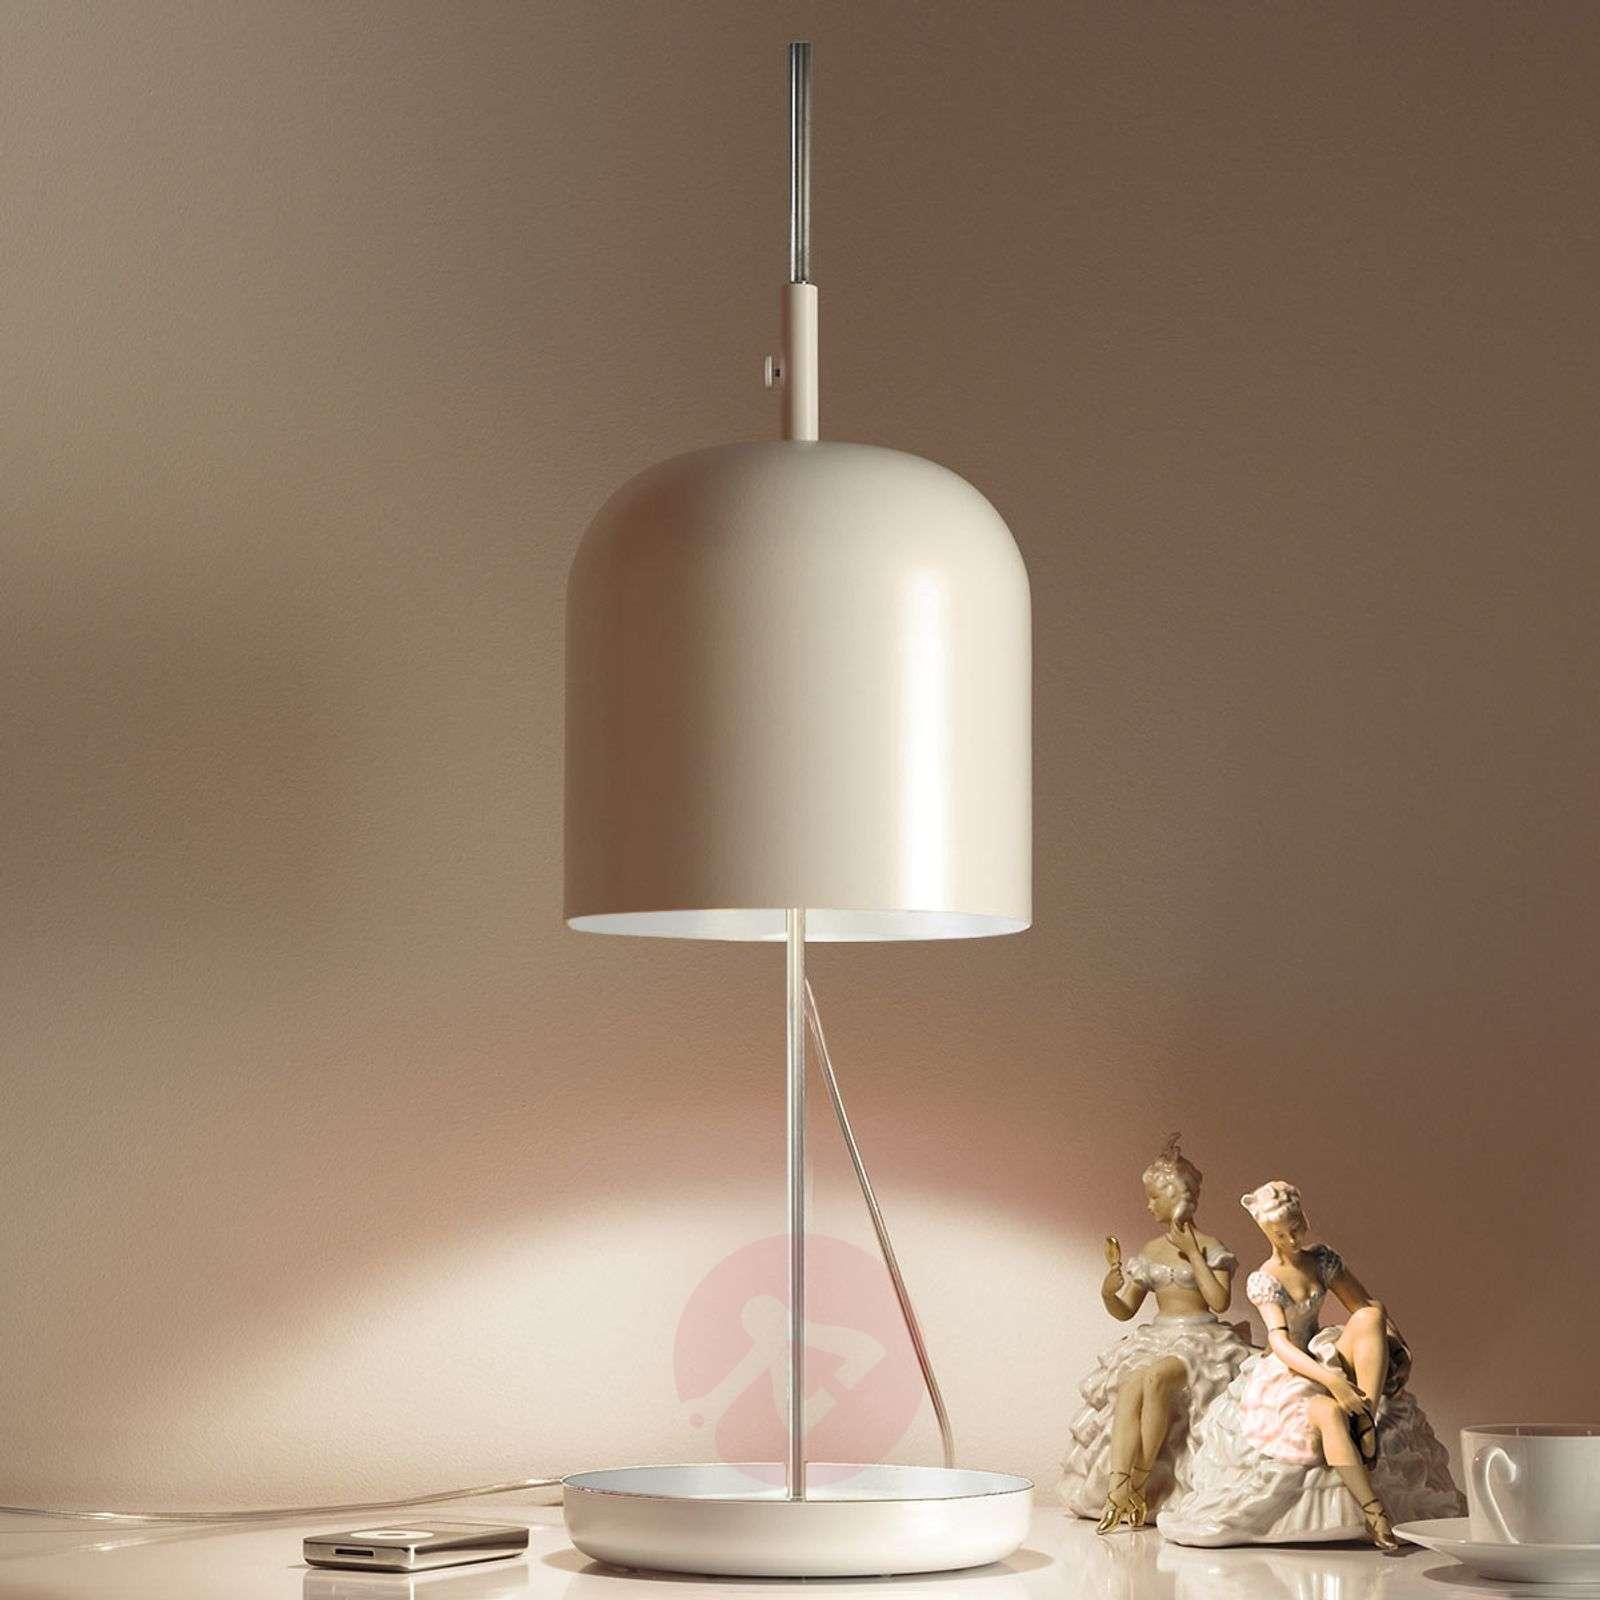 Modern LED table lamp Puk, white-1071075-01